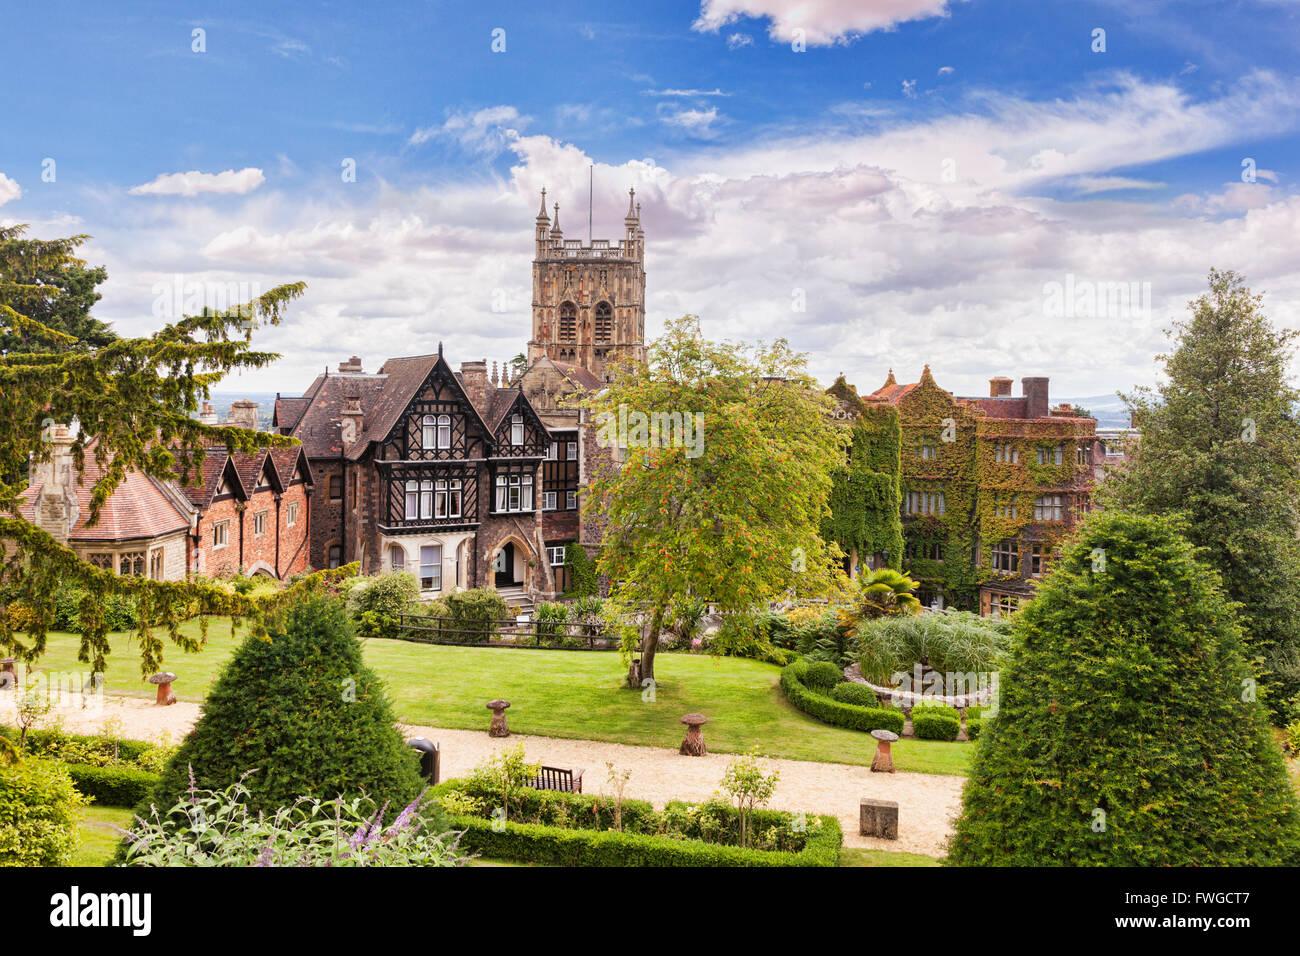 Malvern Priory and Abbey Hotel, Malvern, Worcestershire, England, UK - Stock Image